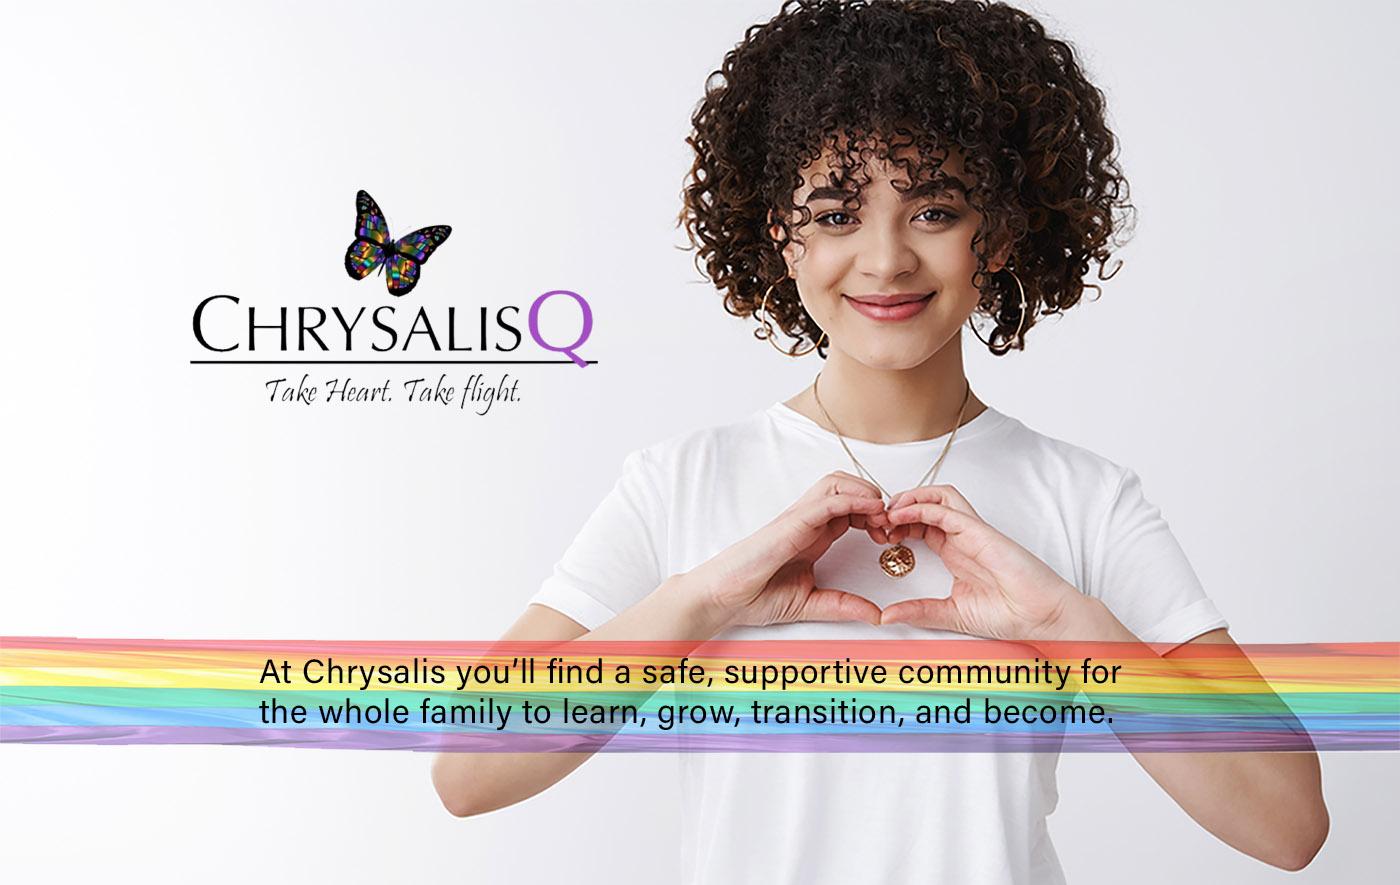 ChrysalisQ - Take Heart Take Flight